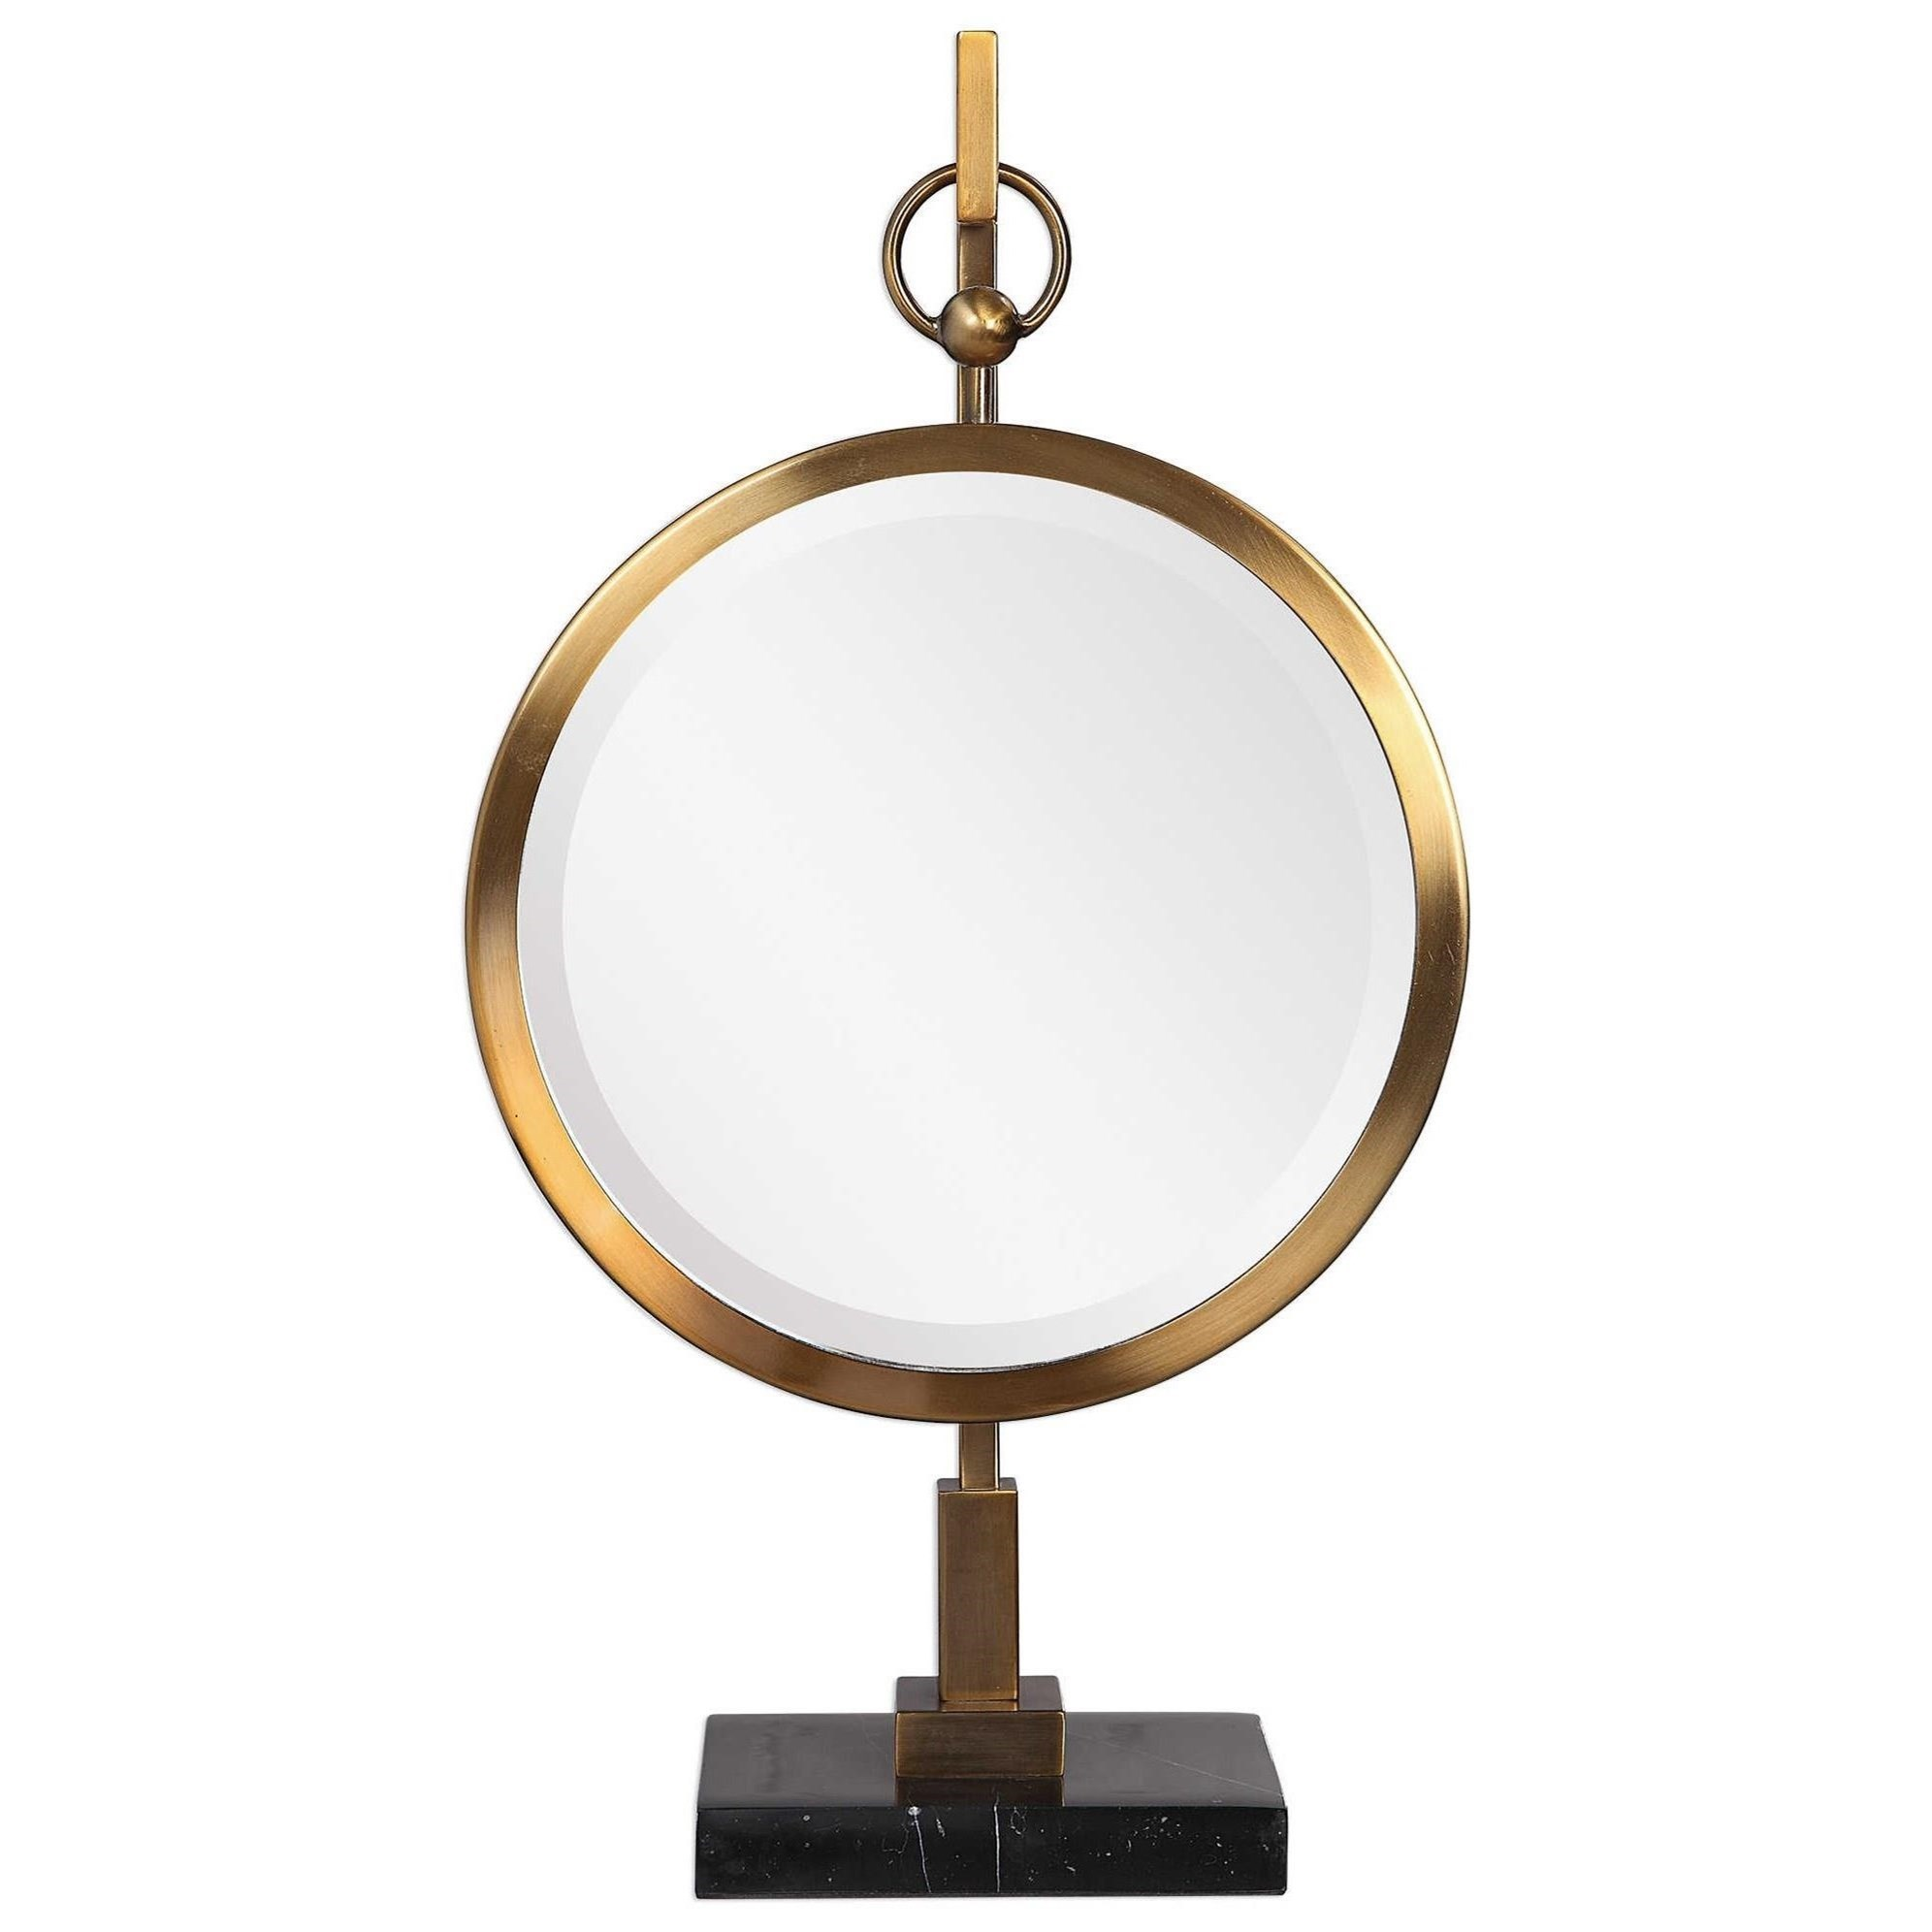 Accessories Nori Bronze Tabletop Mirror by Uttermost at Dunk & Bright Furniture